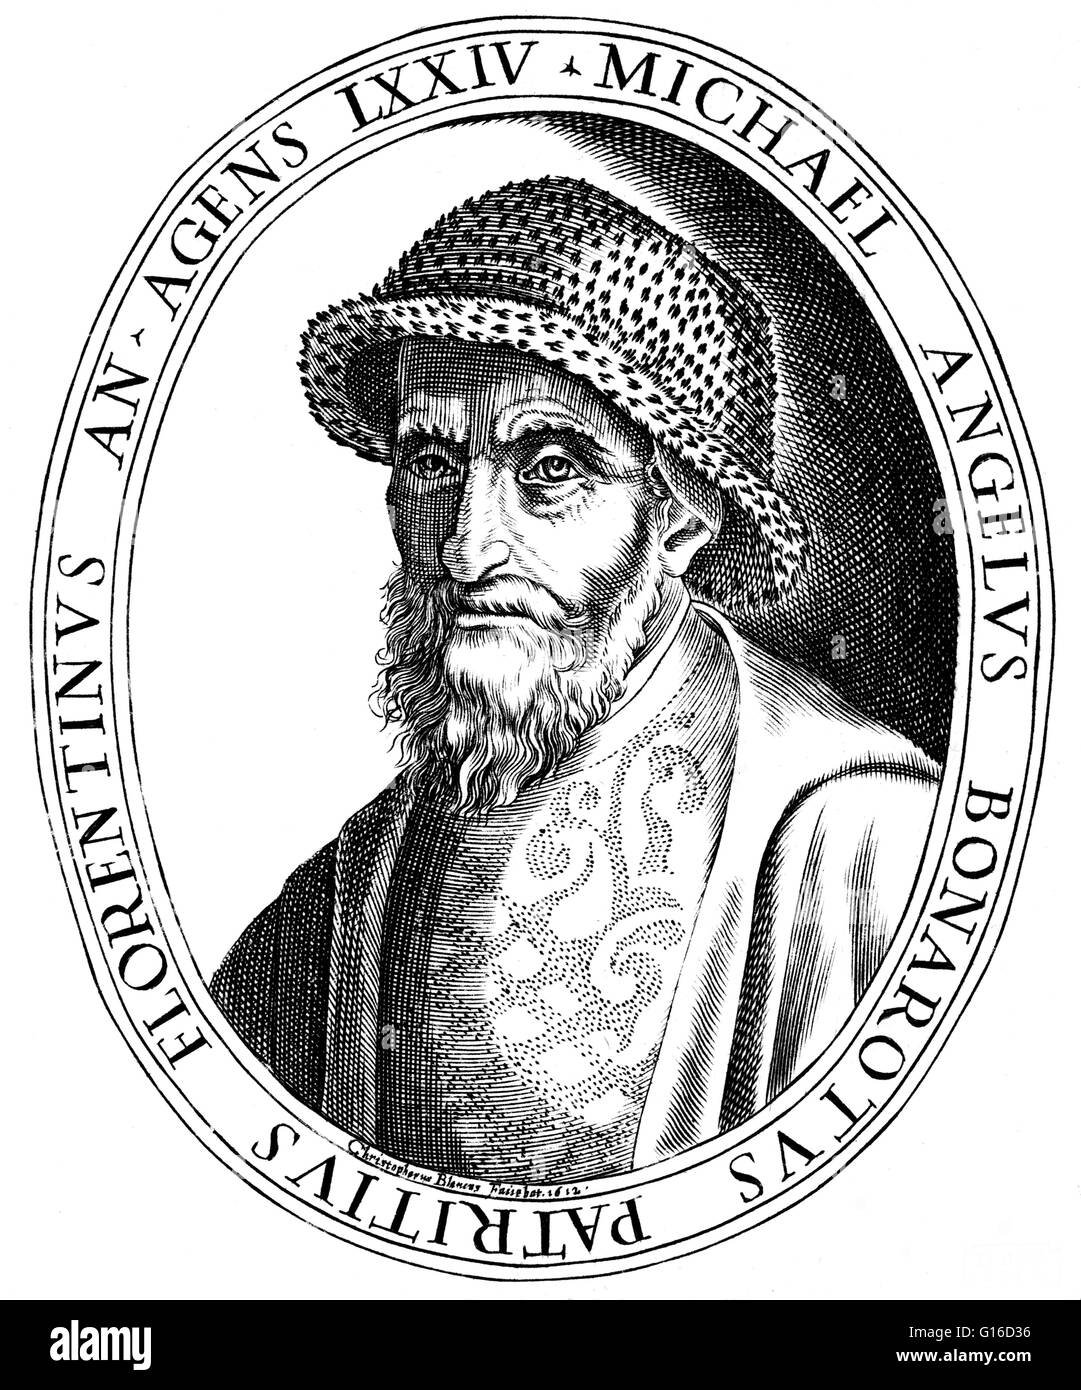 Grabado de Michelangelo por Christoforo Bianchi, 1612. Michelangelo di Lodovico Buonarroti Simoni (6 de marzo de Imagen De Stock